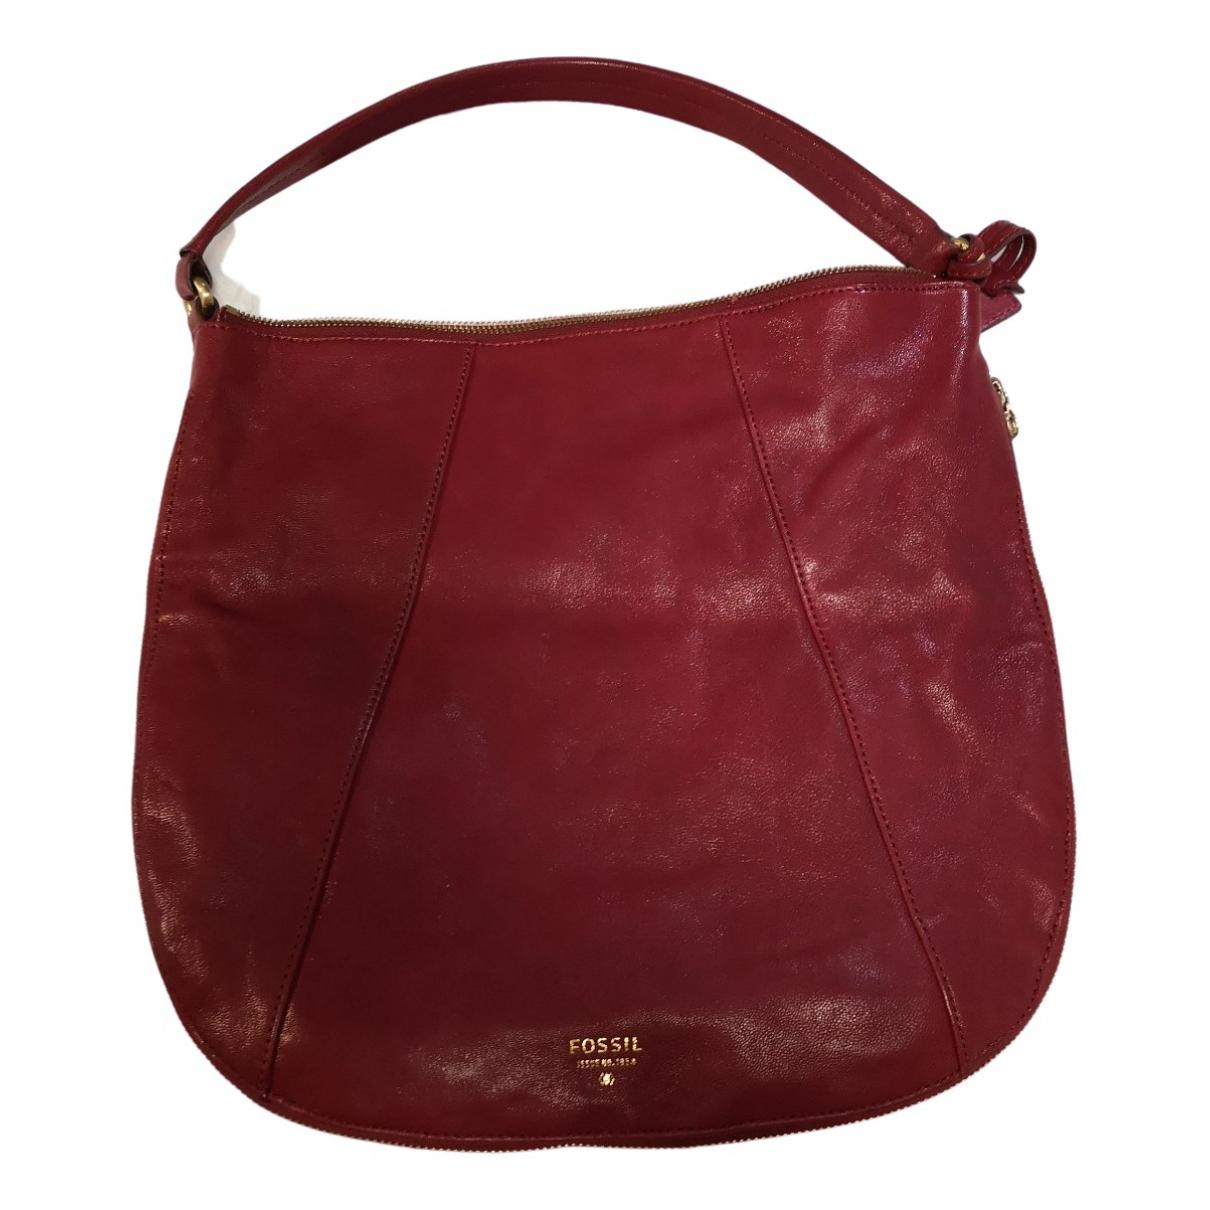 Fossil N Red Leather handbag for Women N